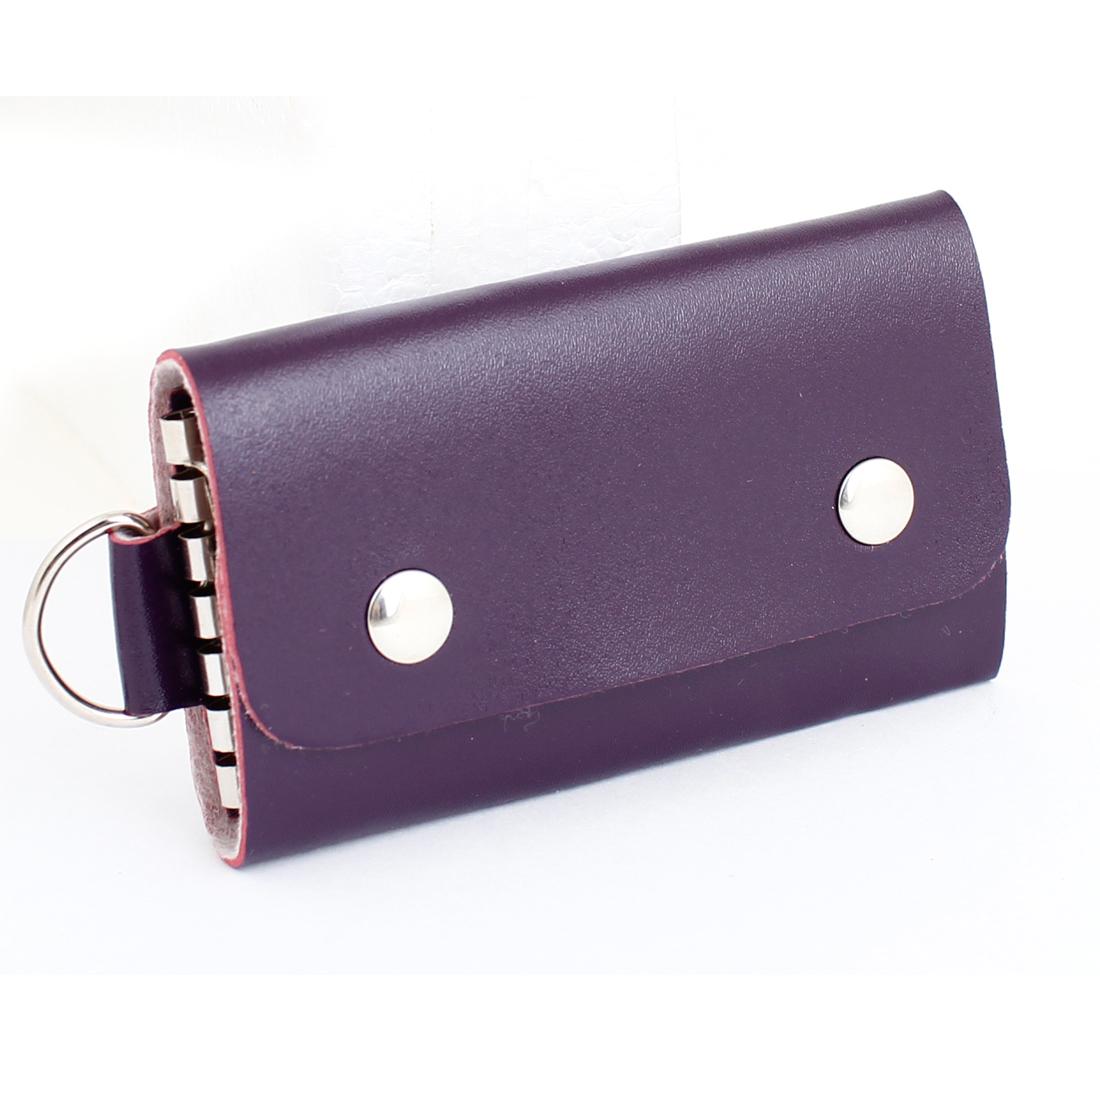 Portable Faux Leather Key Bag Keychain Holder Case Purse Purple